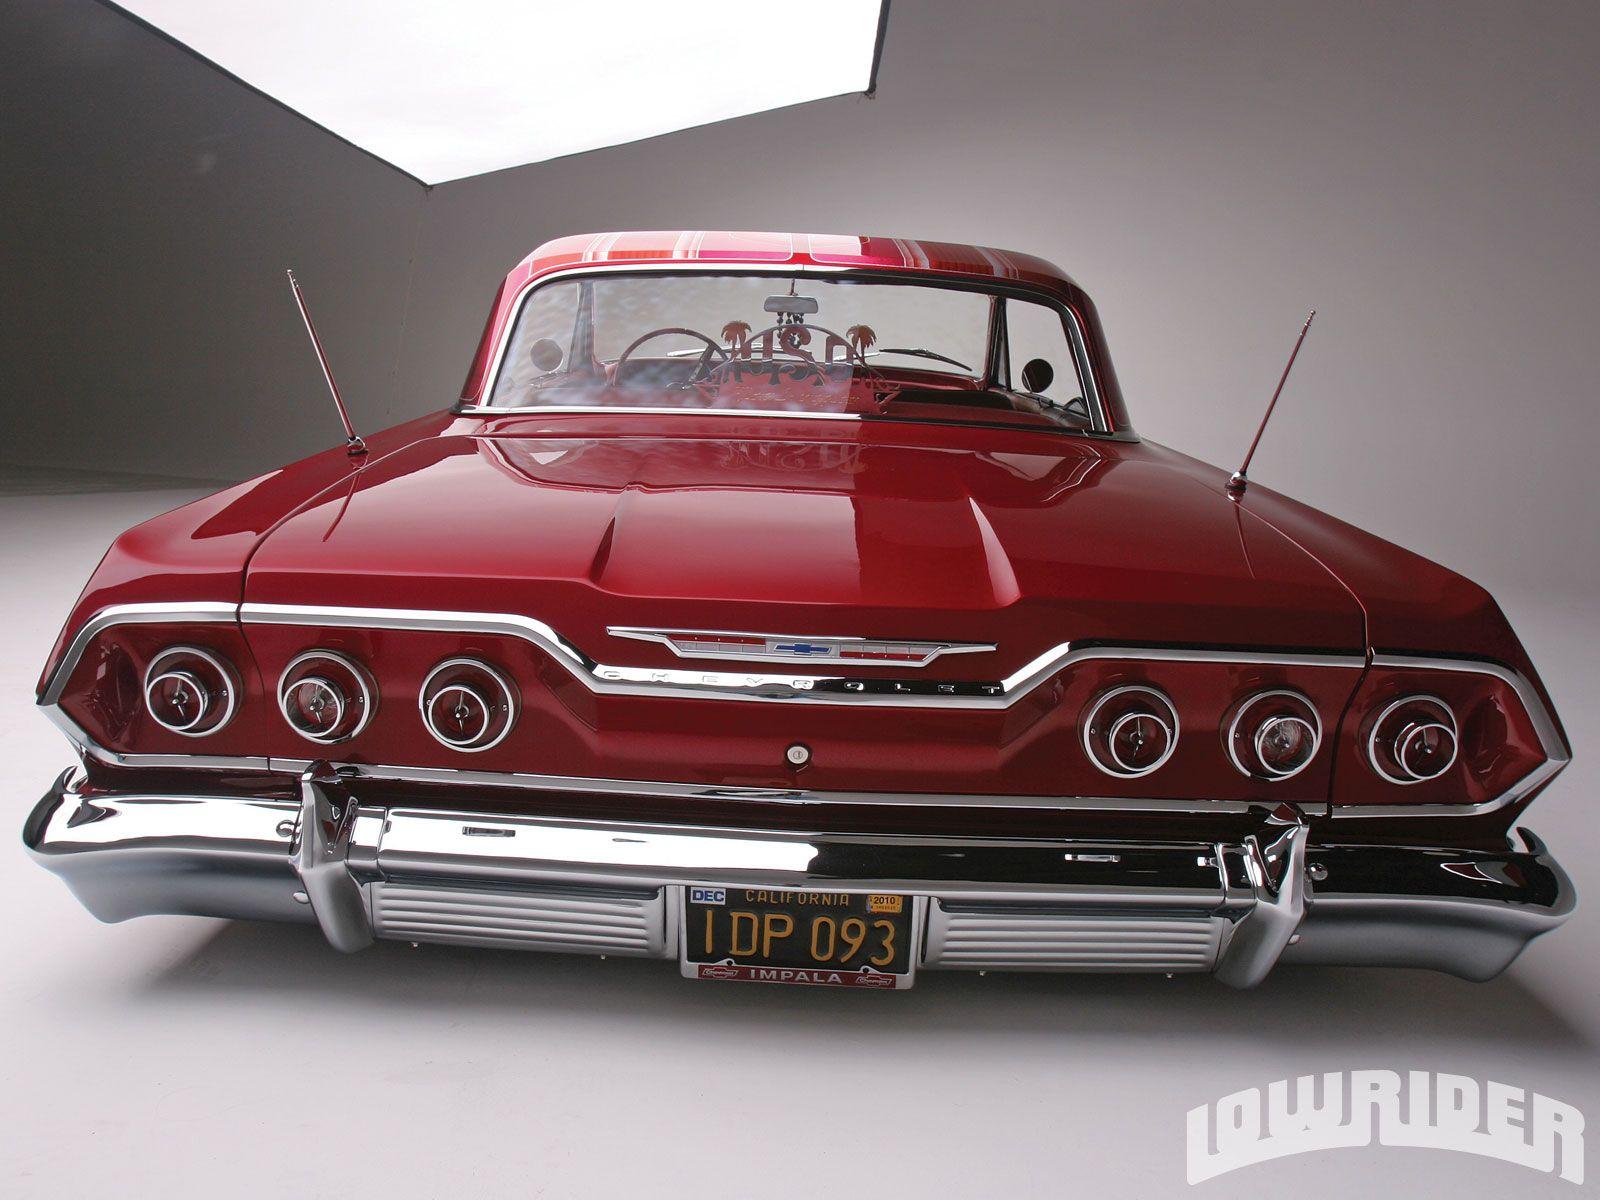 chevrolet impala Recherche Google Chevrolet impala